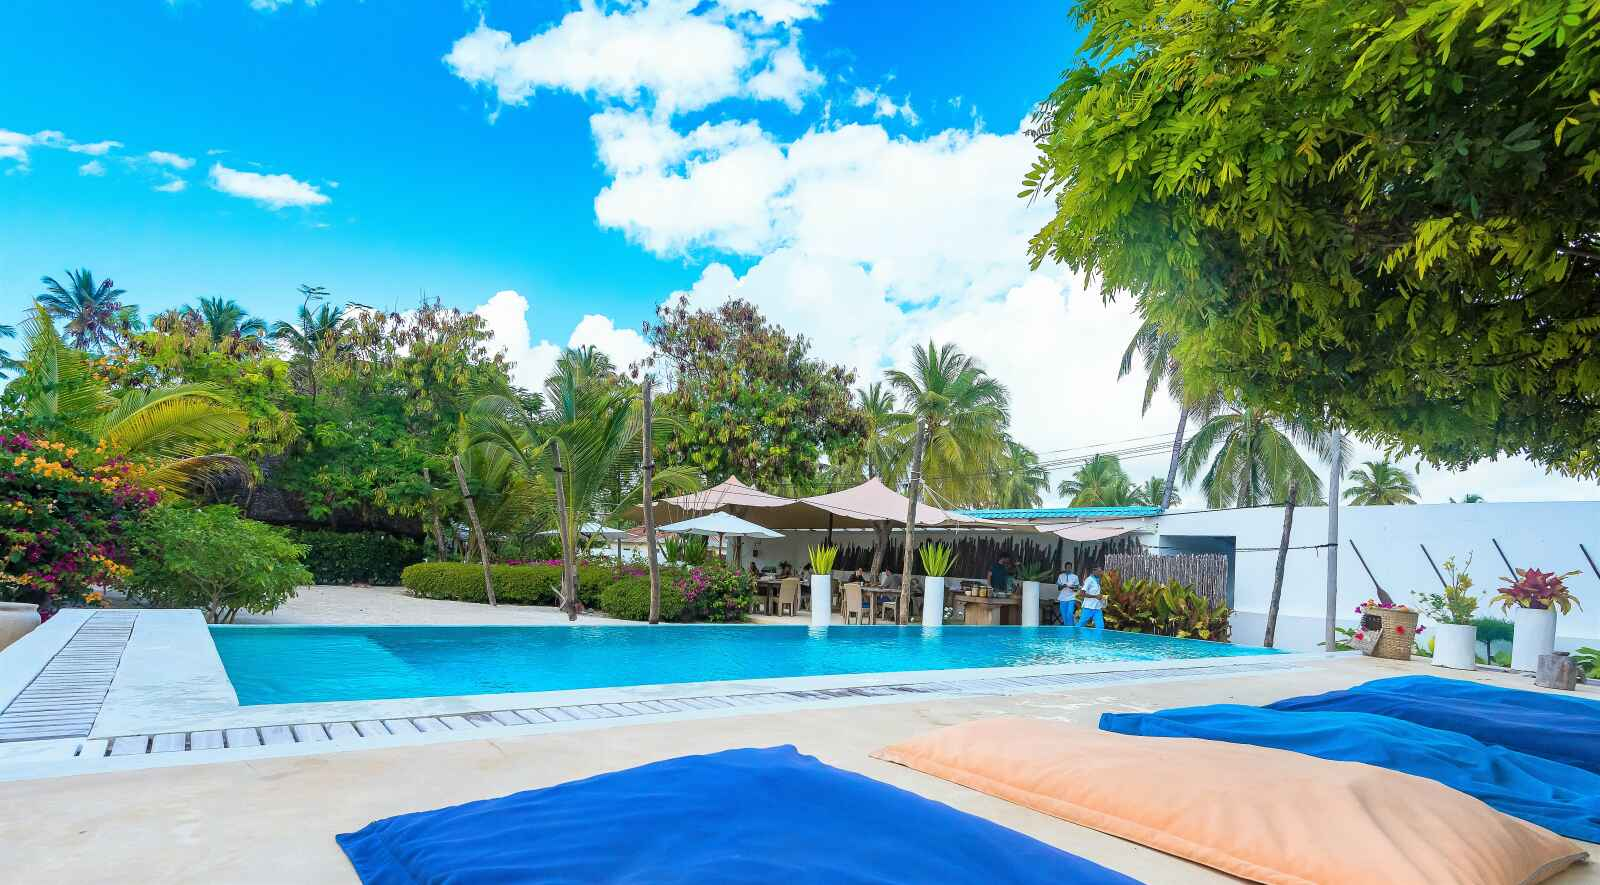 Tanzanie - Zanzibar - Hôtel Indigo Beach Zanzibar 3*